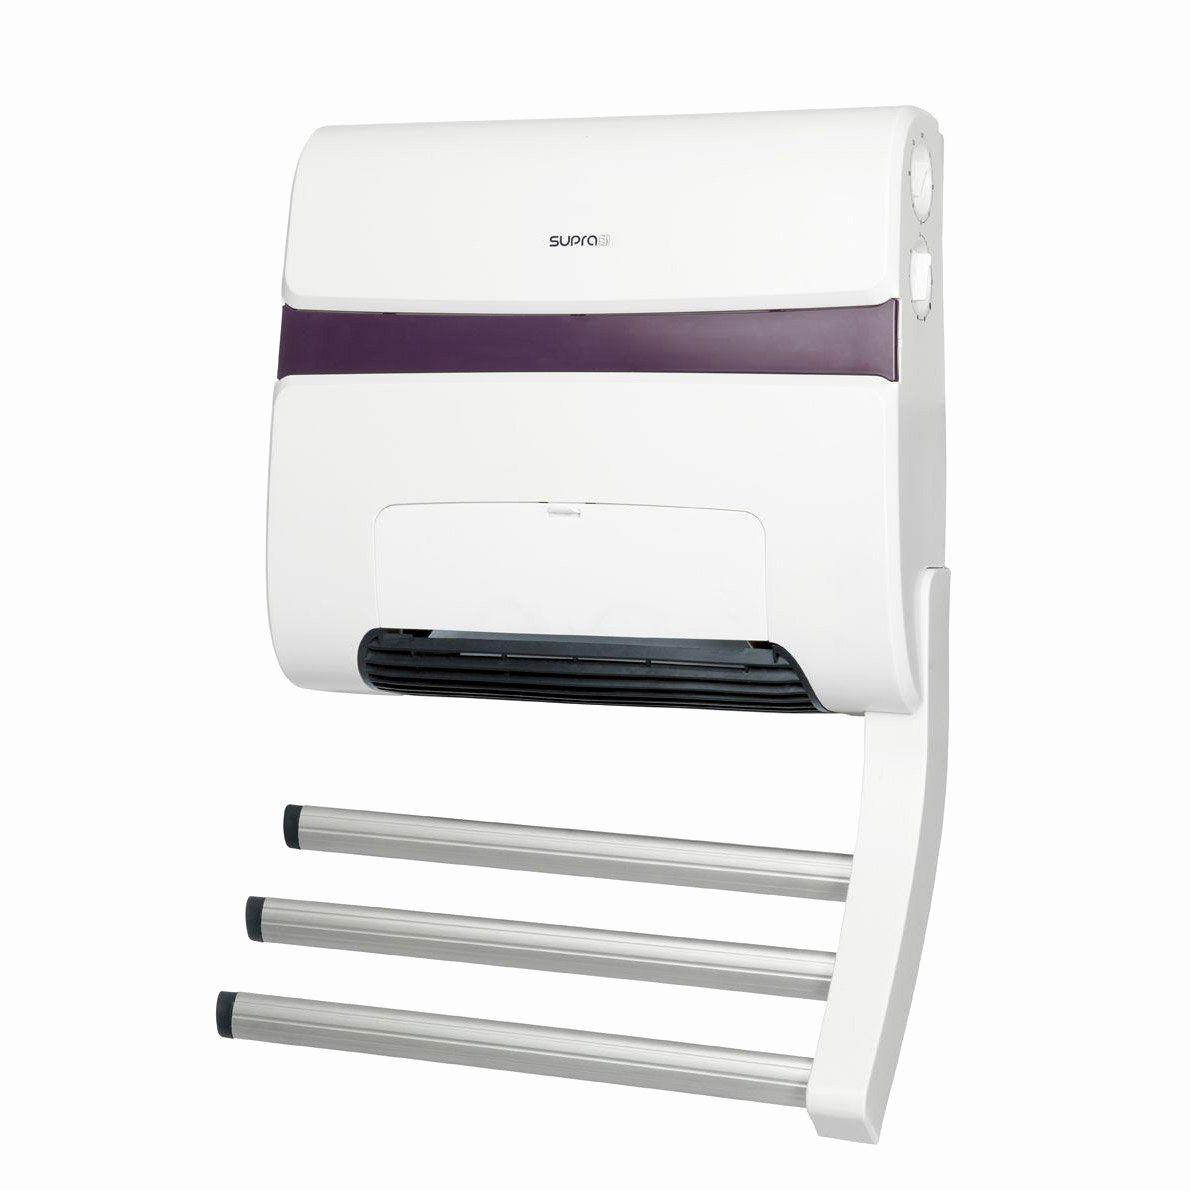 16 Chauffage Salle De Bain Castorama 168  Towel rack, Ironing